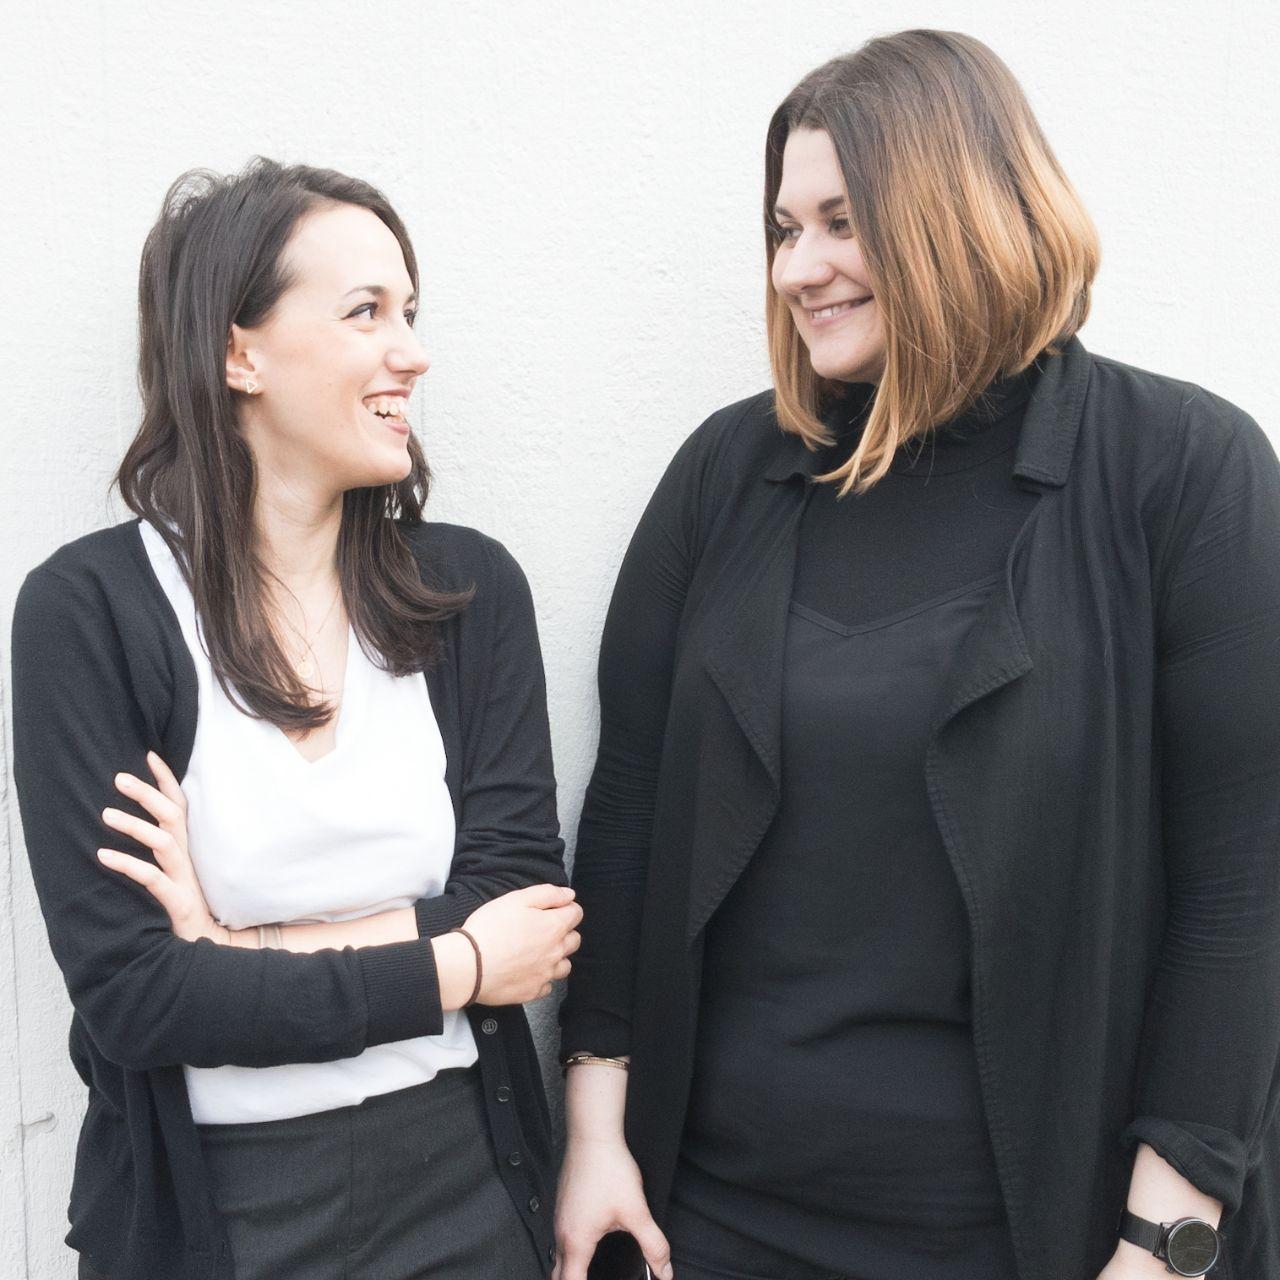 Melina und Sara